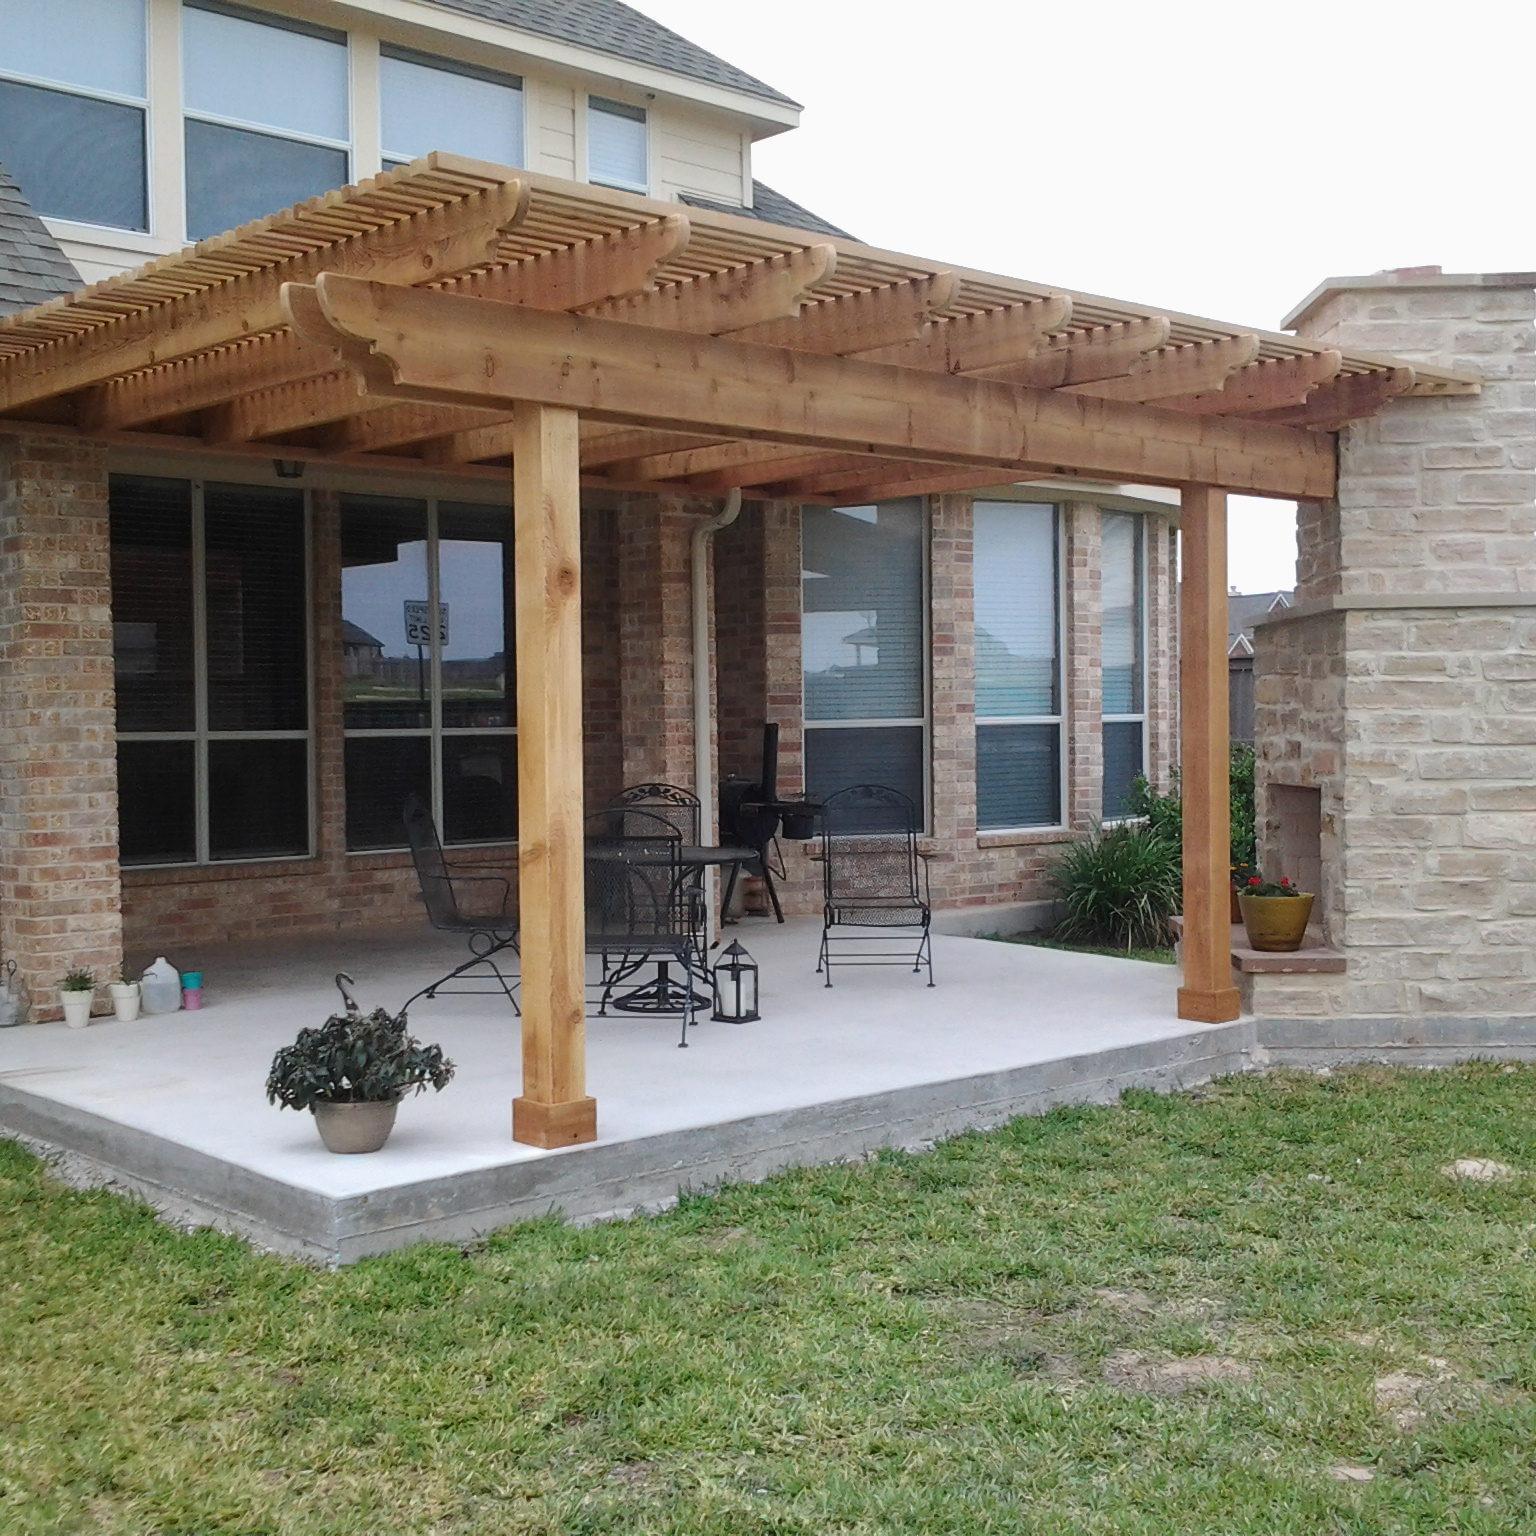 Patio Enclosures Austin Tx: Patio Cover Contractor Austin Tx €� Fence Ideas Site